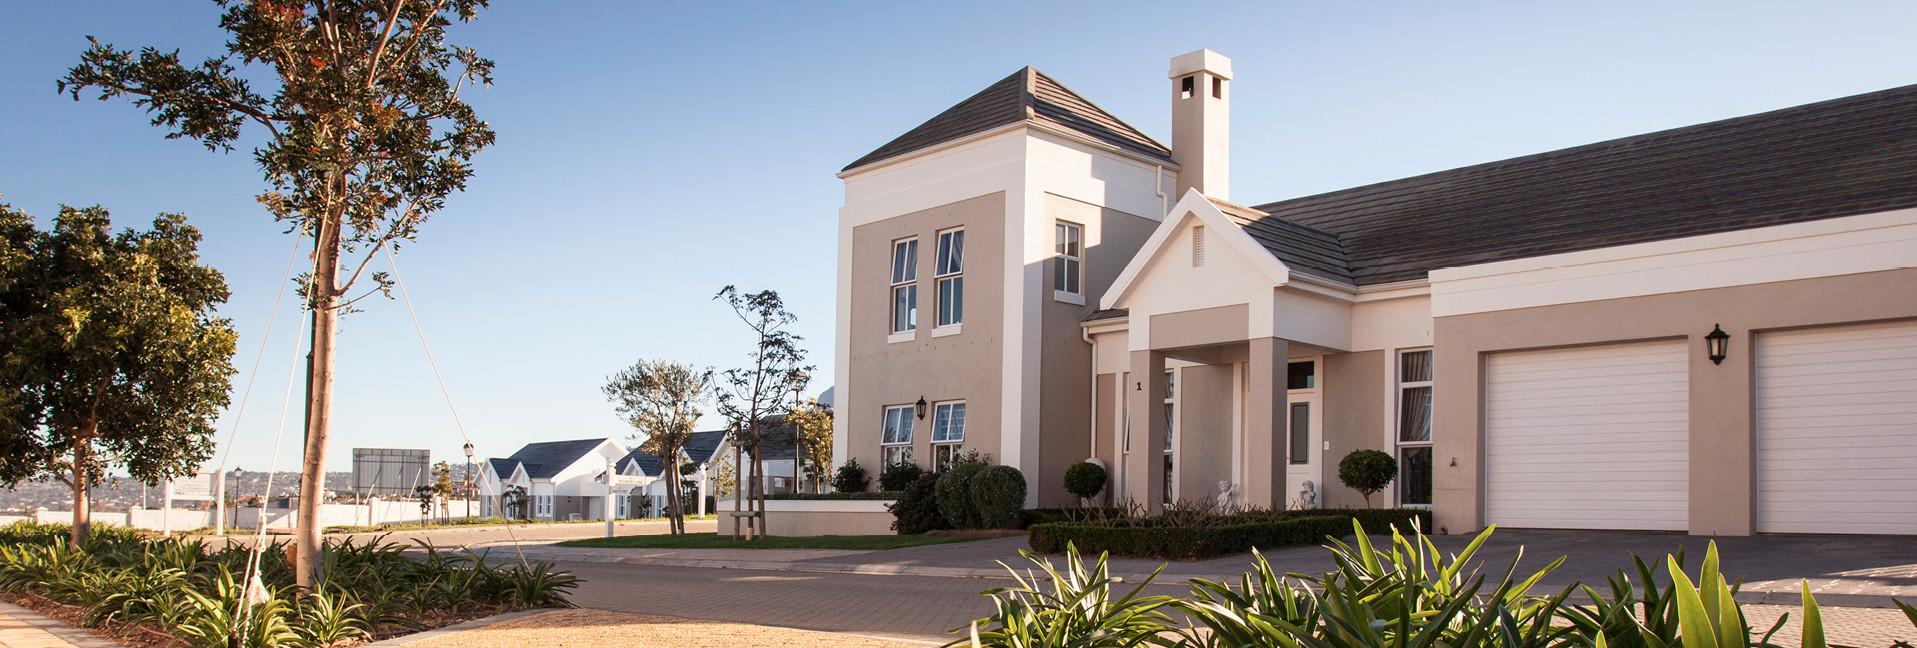 The Somerset Lifestyle & Retirement Village